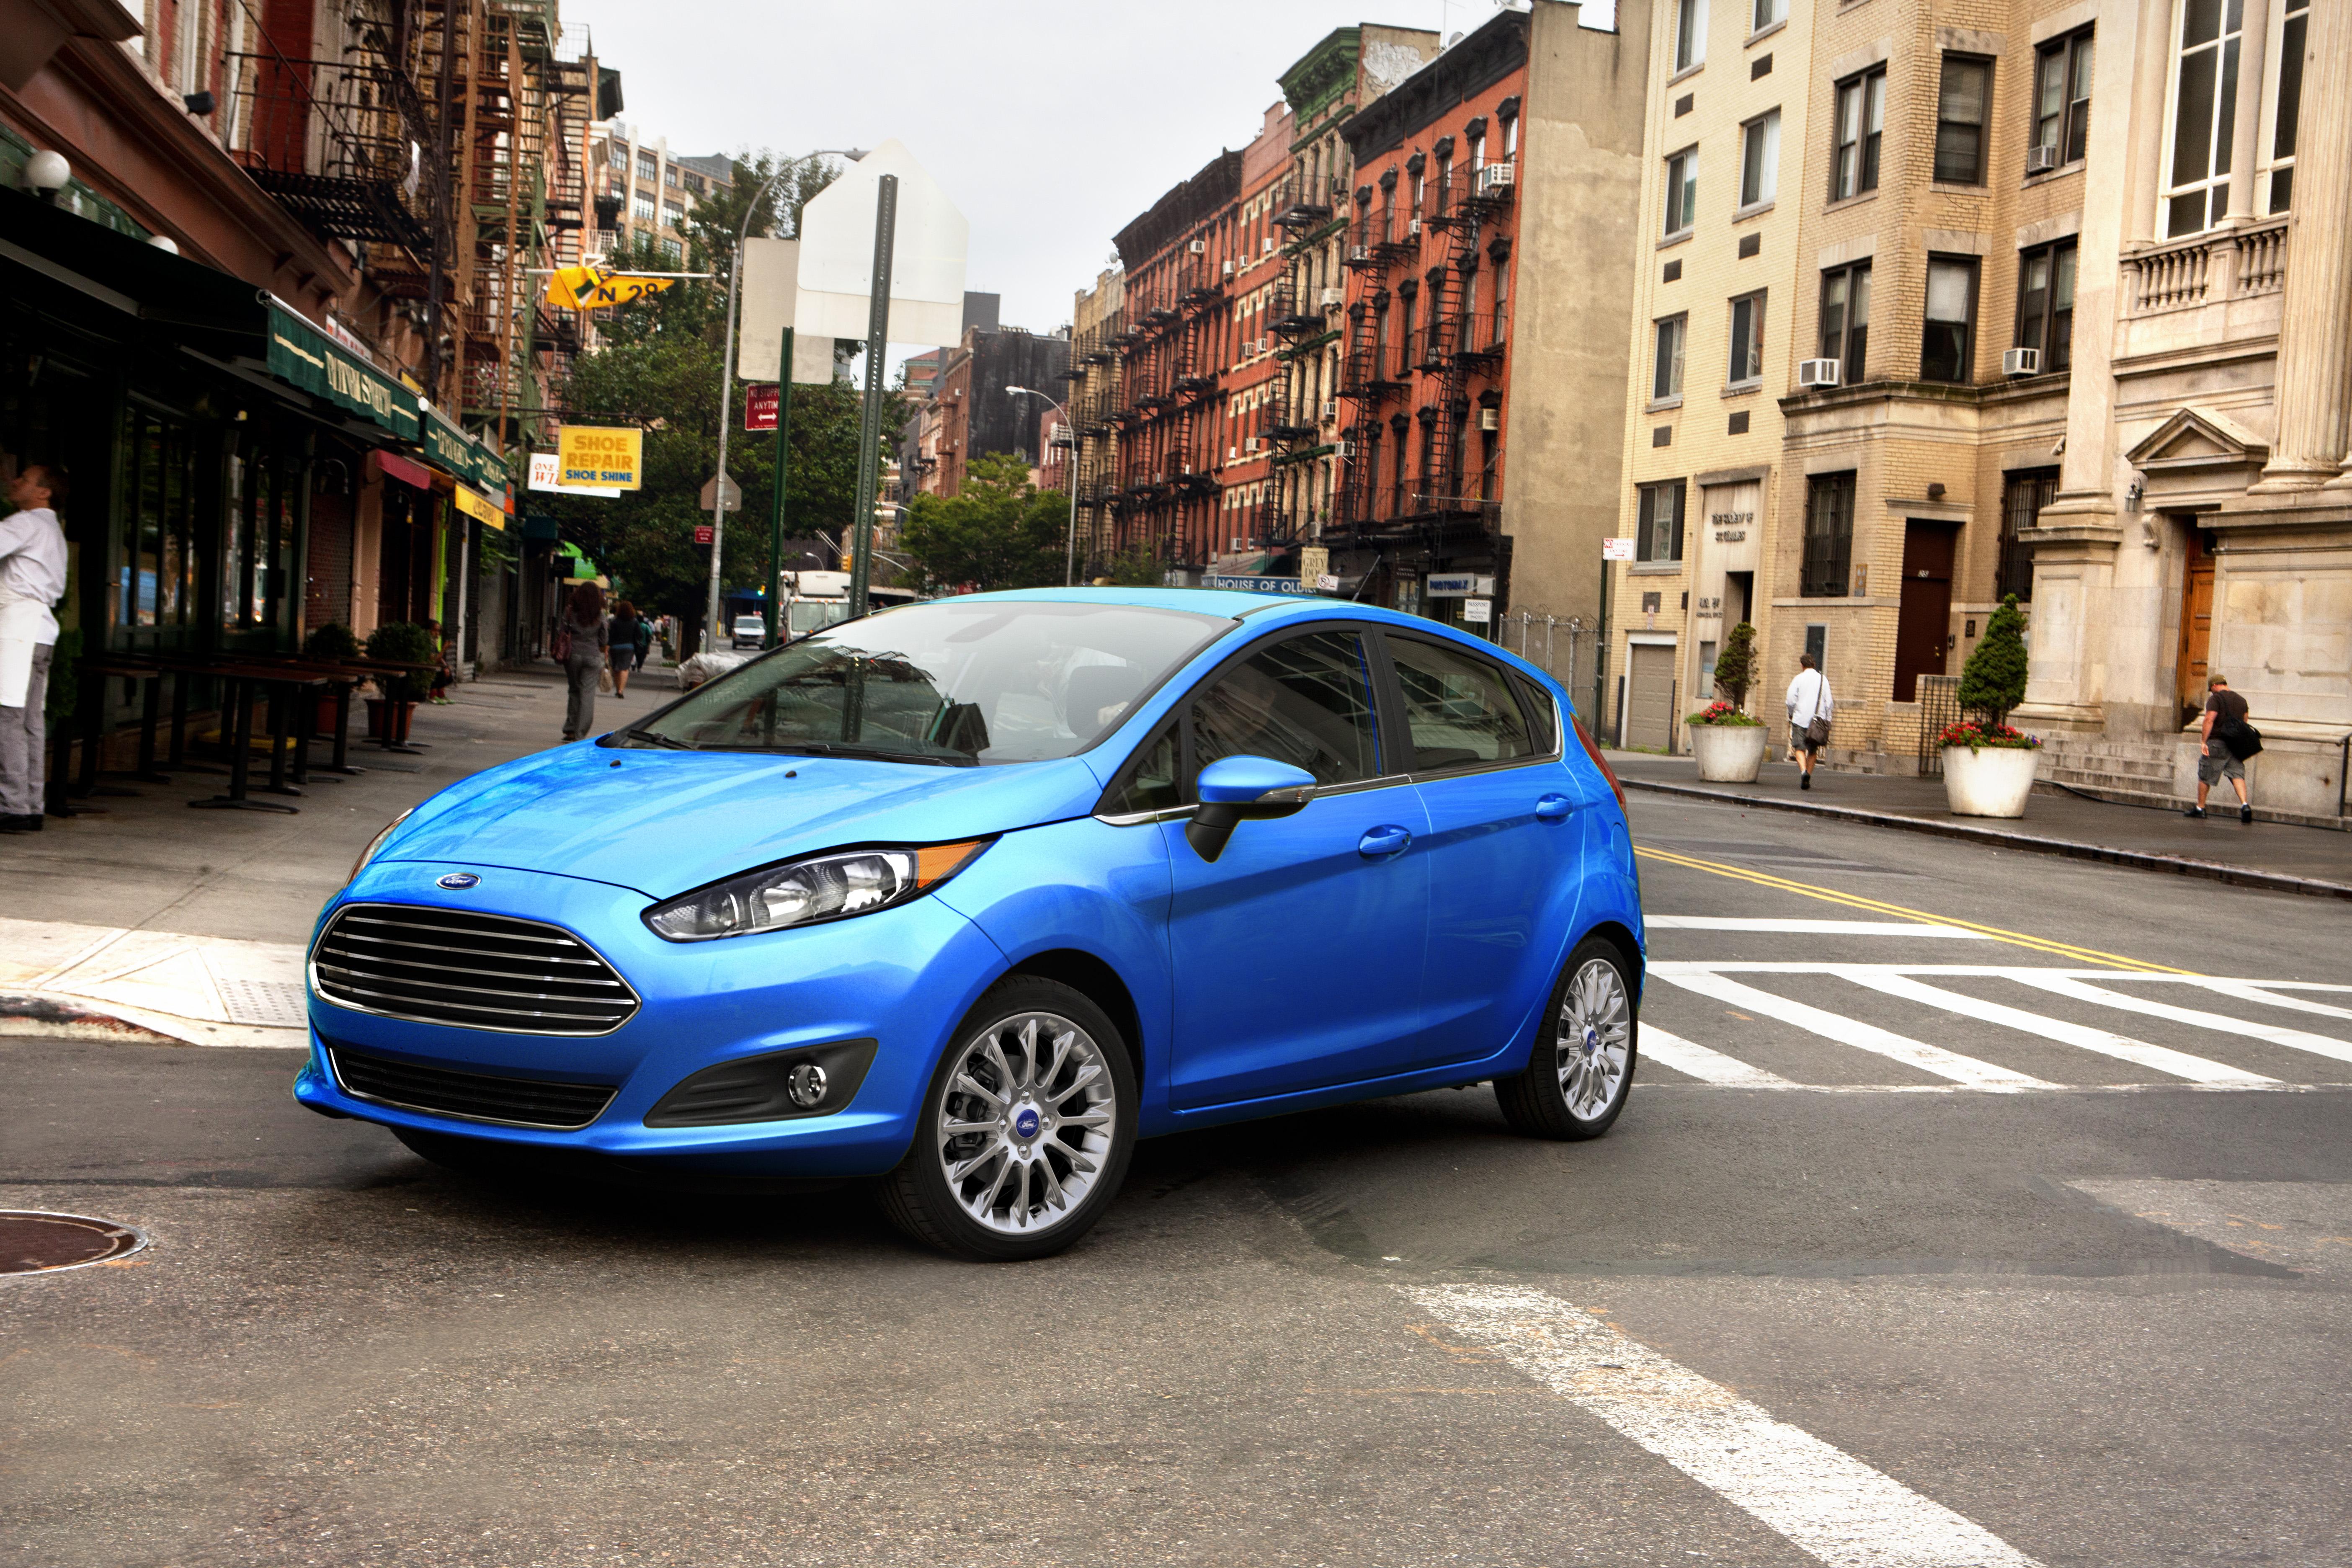 2017 Ford Fiesta